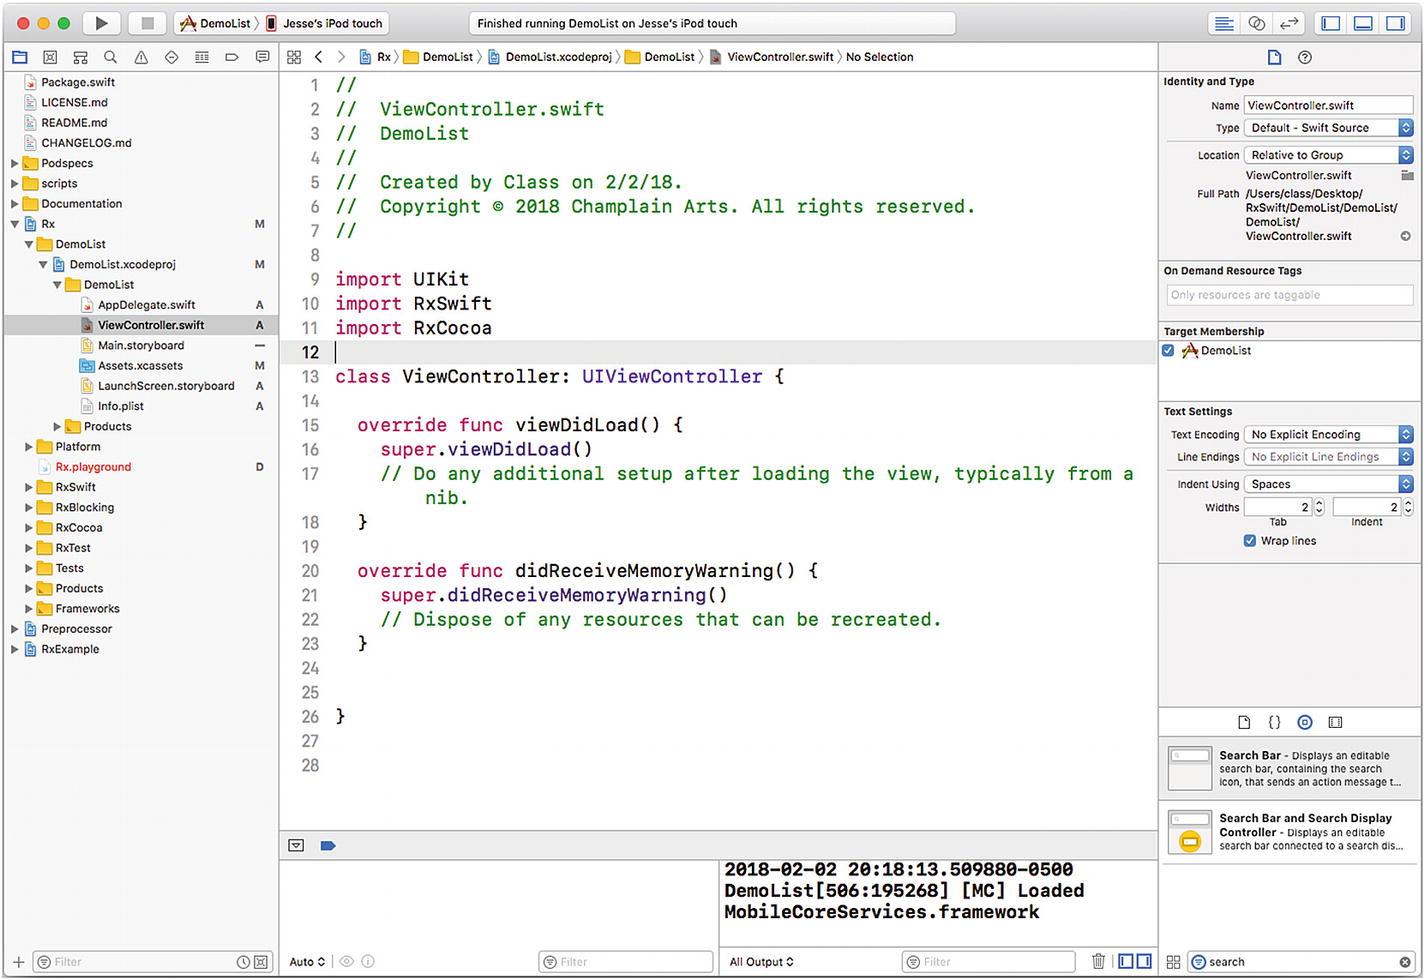 Build a ReactiveX/RxSwift App   SpringerLink